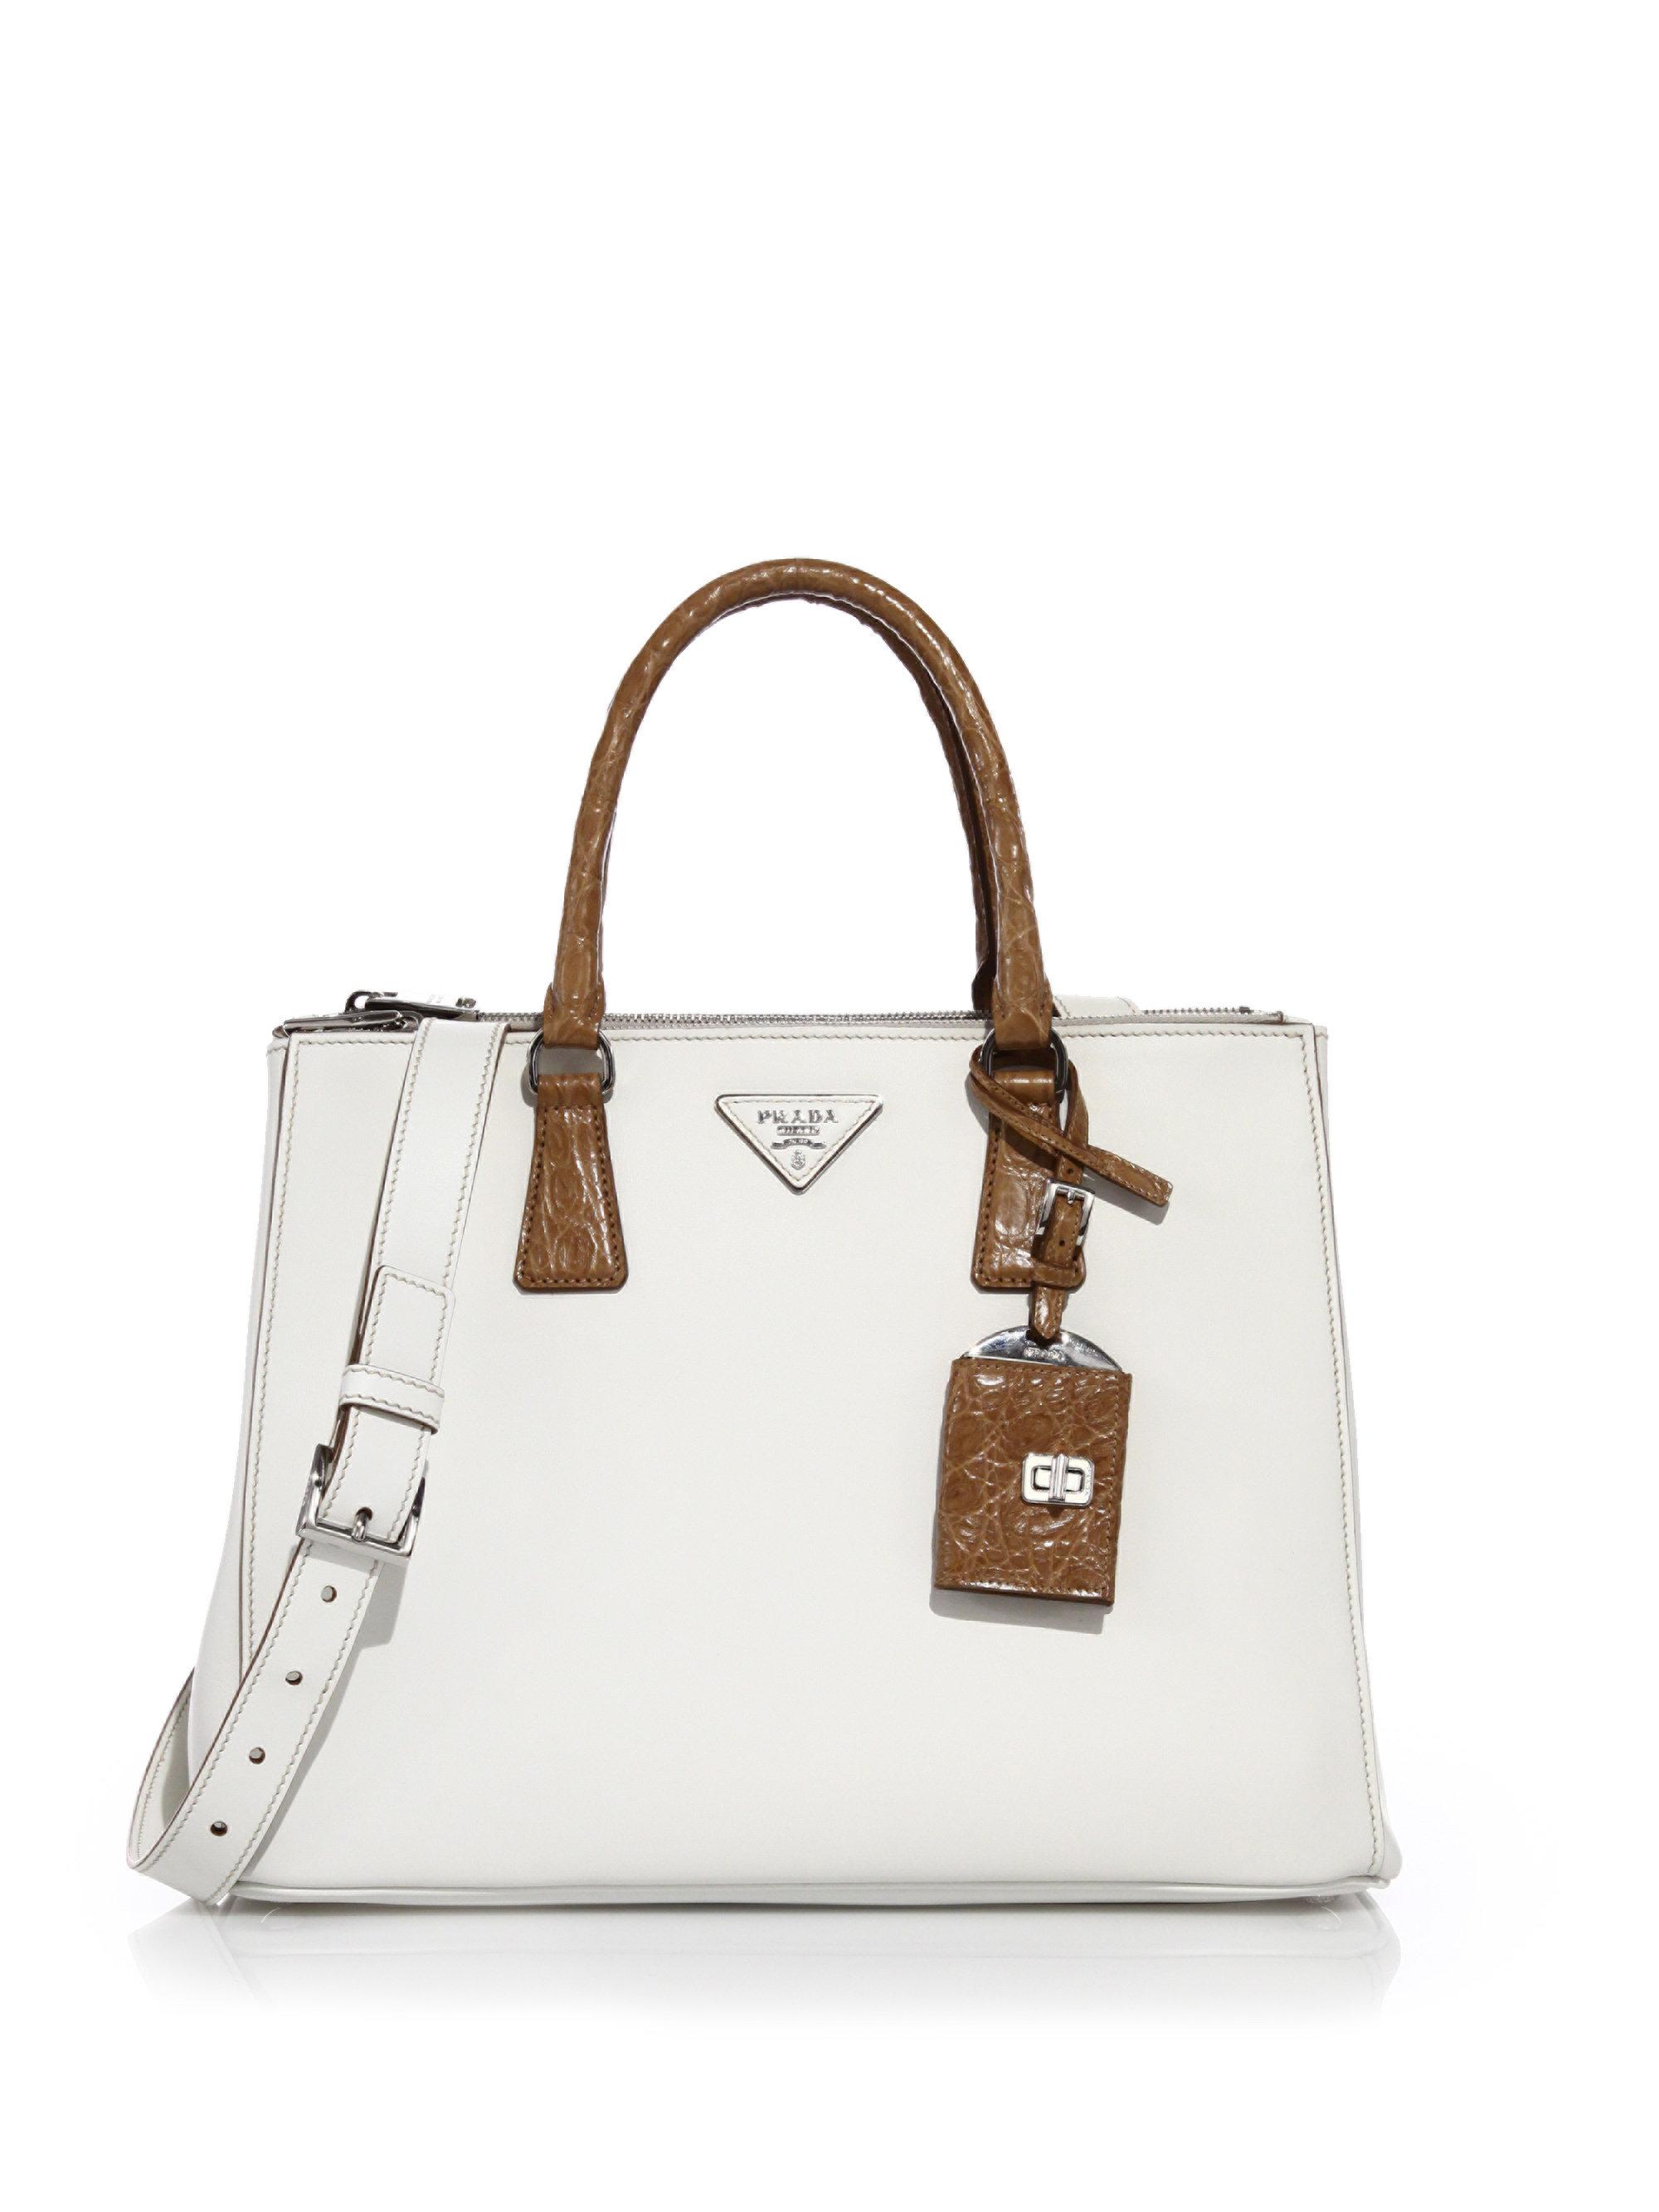 de090097b22b Prada Galleria Medium Leather And Crocodile Tote in White - Lyst